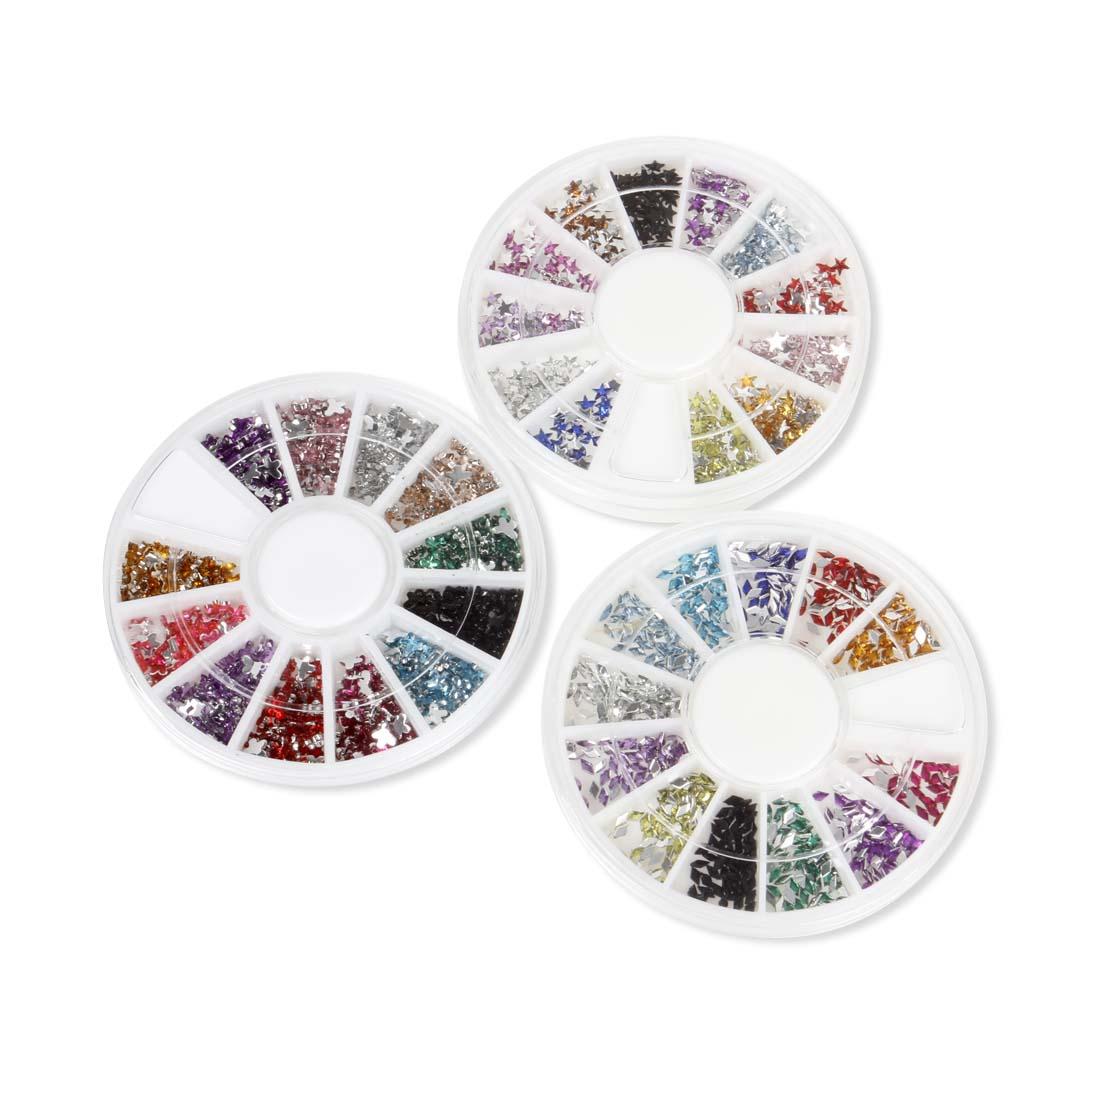 BMC 500pc Mixed Colors Acrylic Nail Art Multi Decorations Studs - 3 Wheel Sets